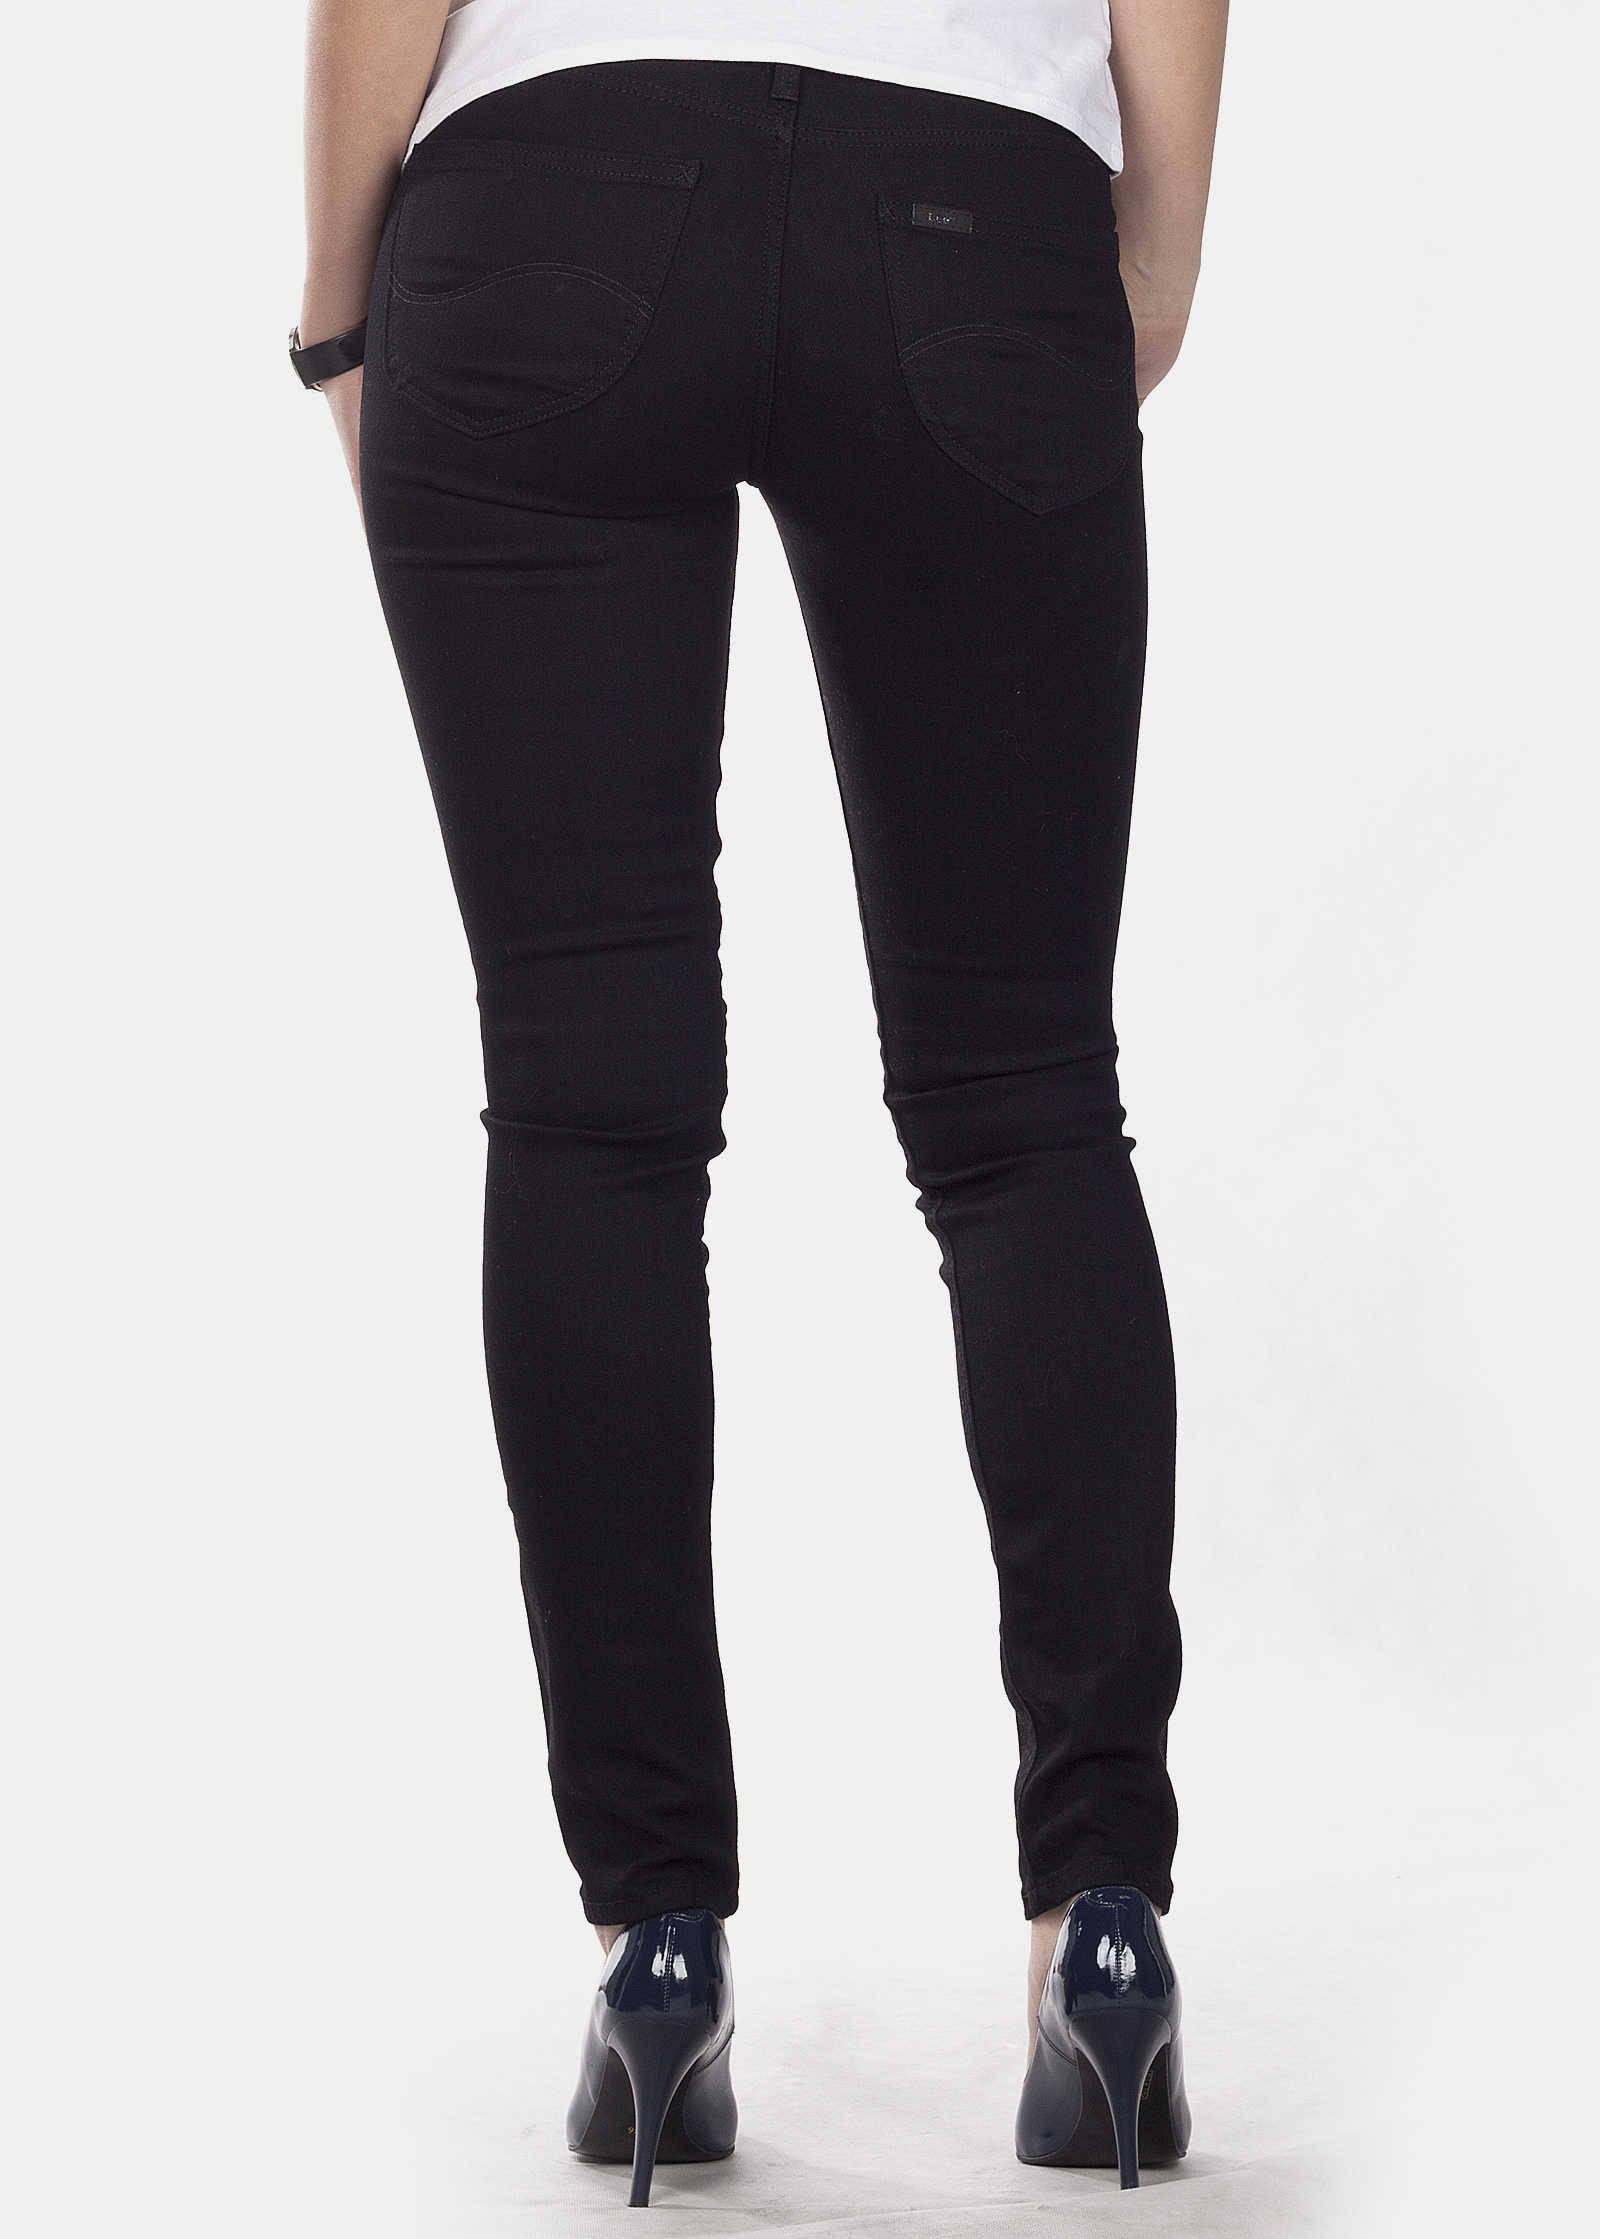 19686237 Woman's Jeans Lee® Scarlett - Black (L526JY47) - Jeans24h - Your ...